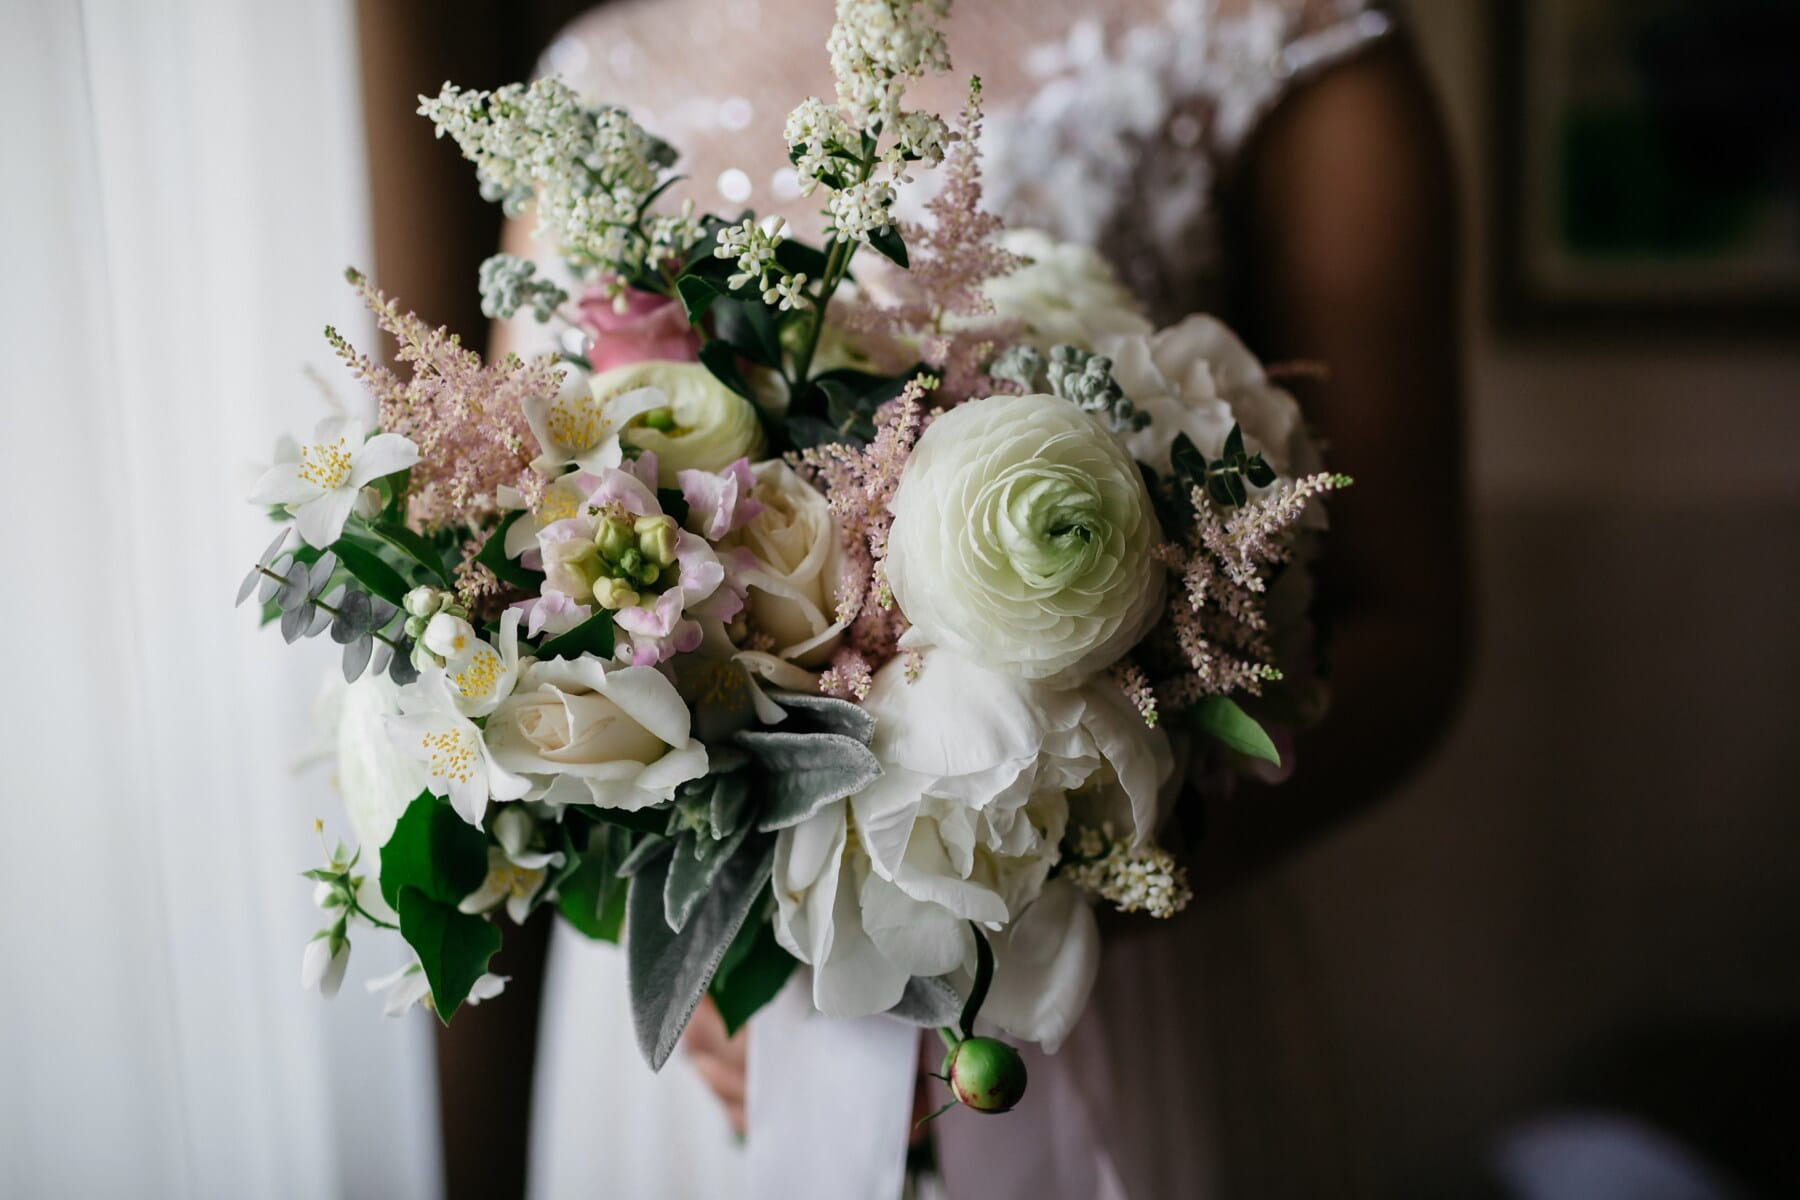 wedding bouquet, bride, elegant, spectacular, bouquet, majestic, wedding, romance, flower, arrangement